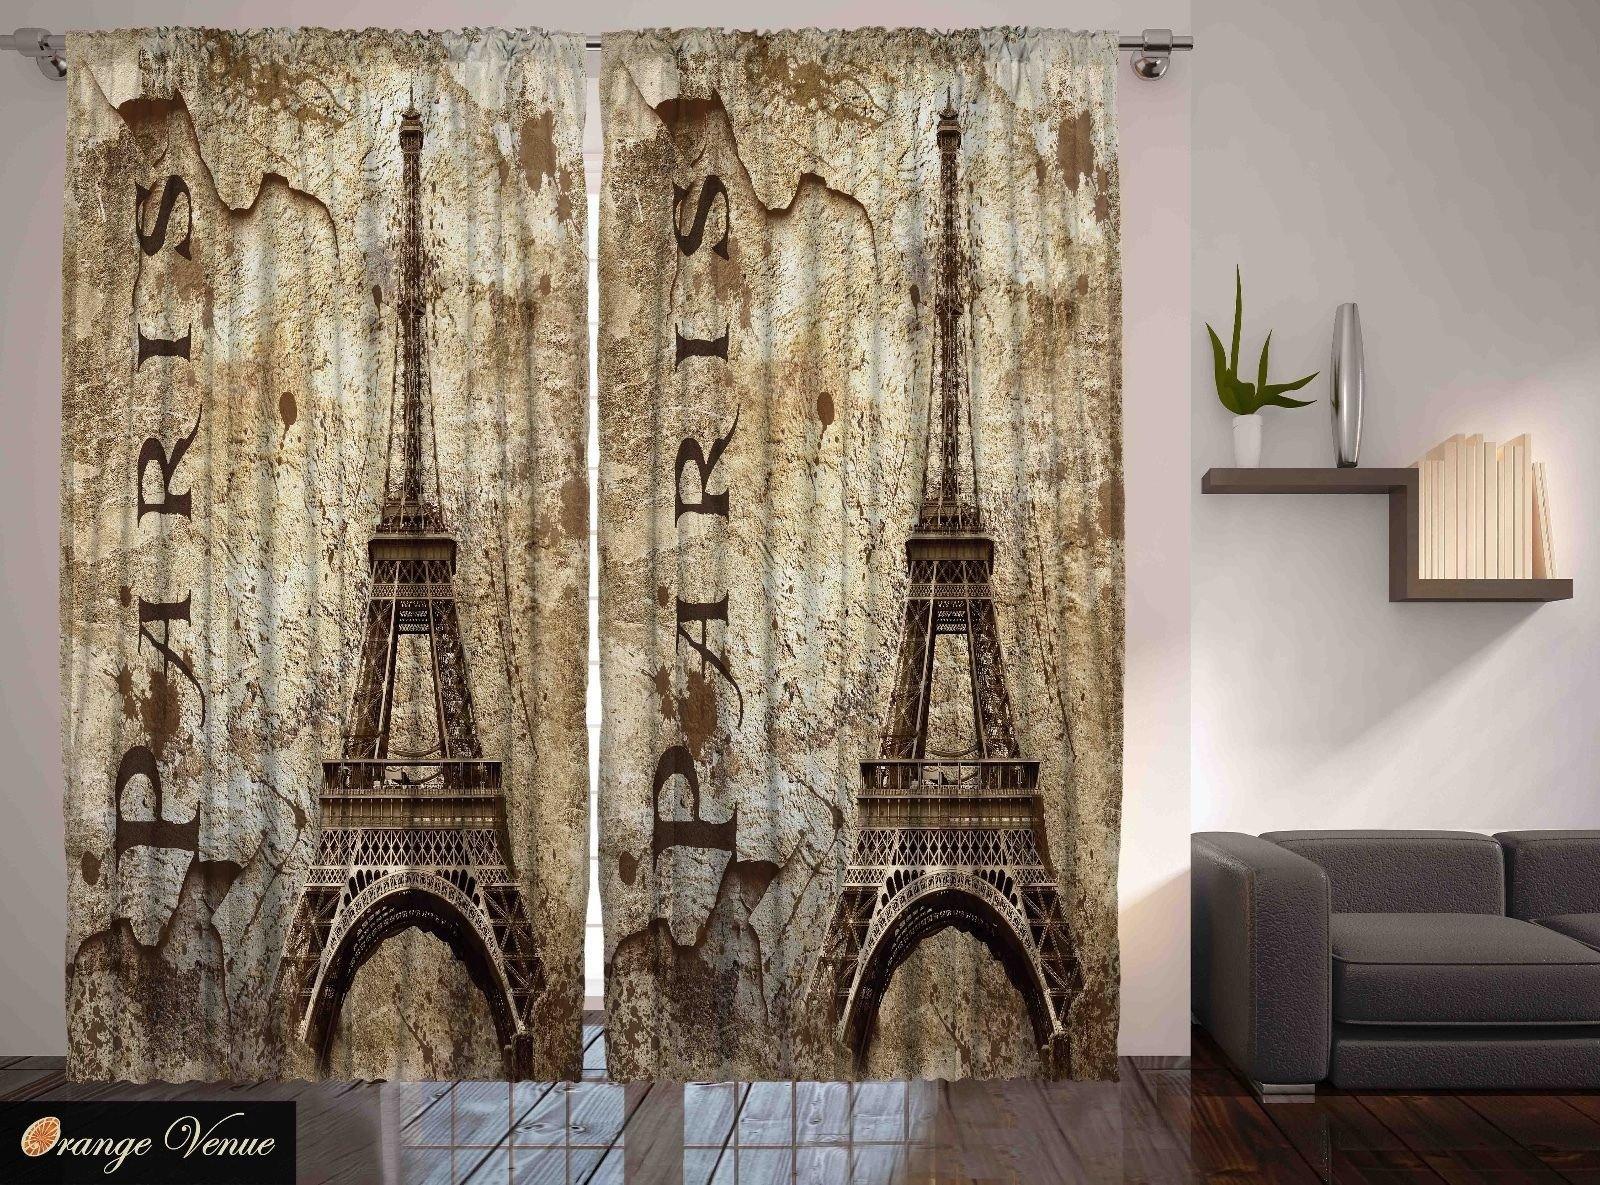 Paris themed Living Room Decor Best Of Paris Decor Eiffel tower Parisian Cityscape themed Living Room Curtain 2 Panels